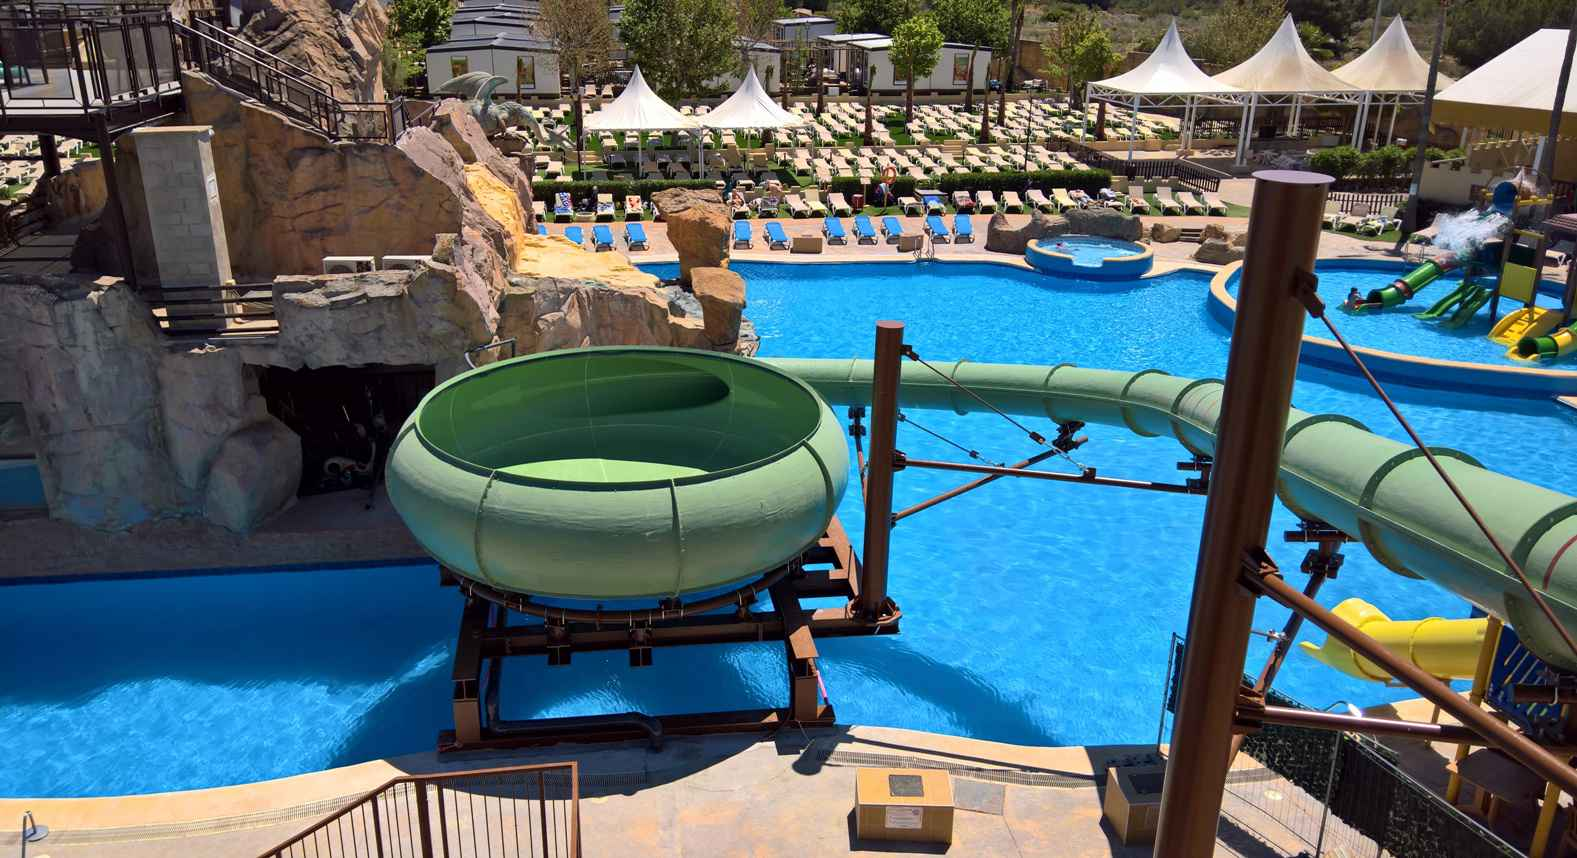 Arihant supplies waterslides to Benidorm's new Robin Hood themed resort